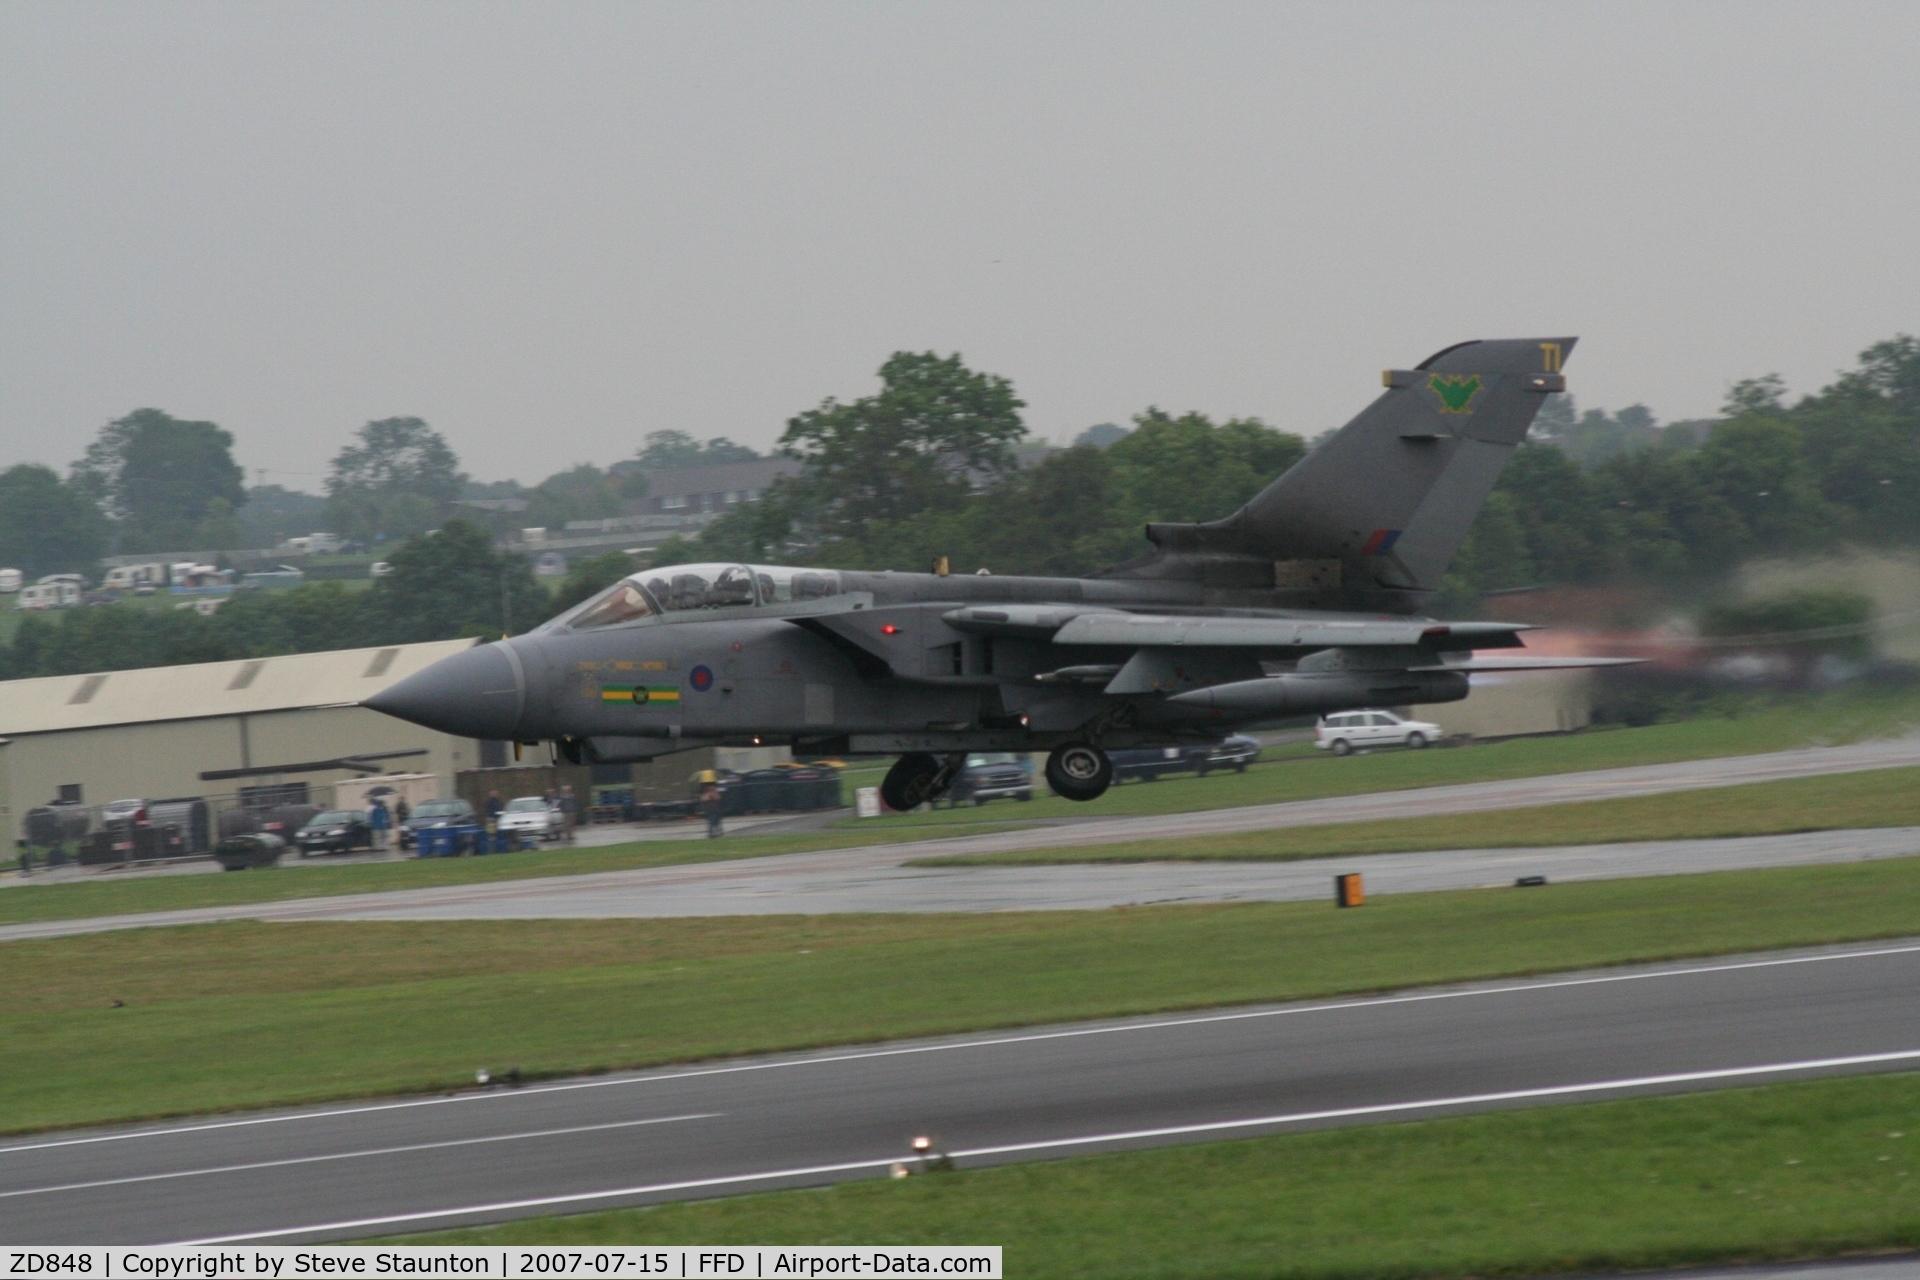 ZD848, 1985 Panavia Tornado GR.4 C/N 441/BS146/3201, Royal International Air Tattoo 2007